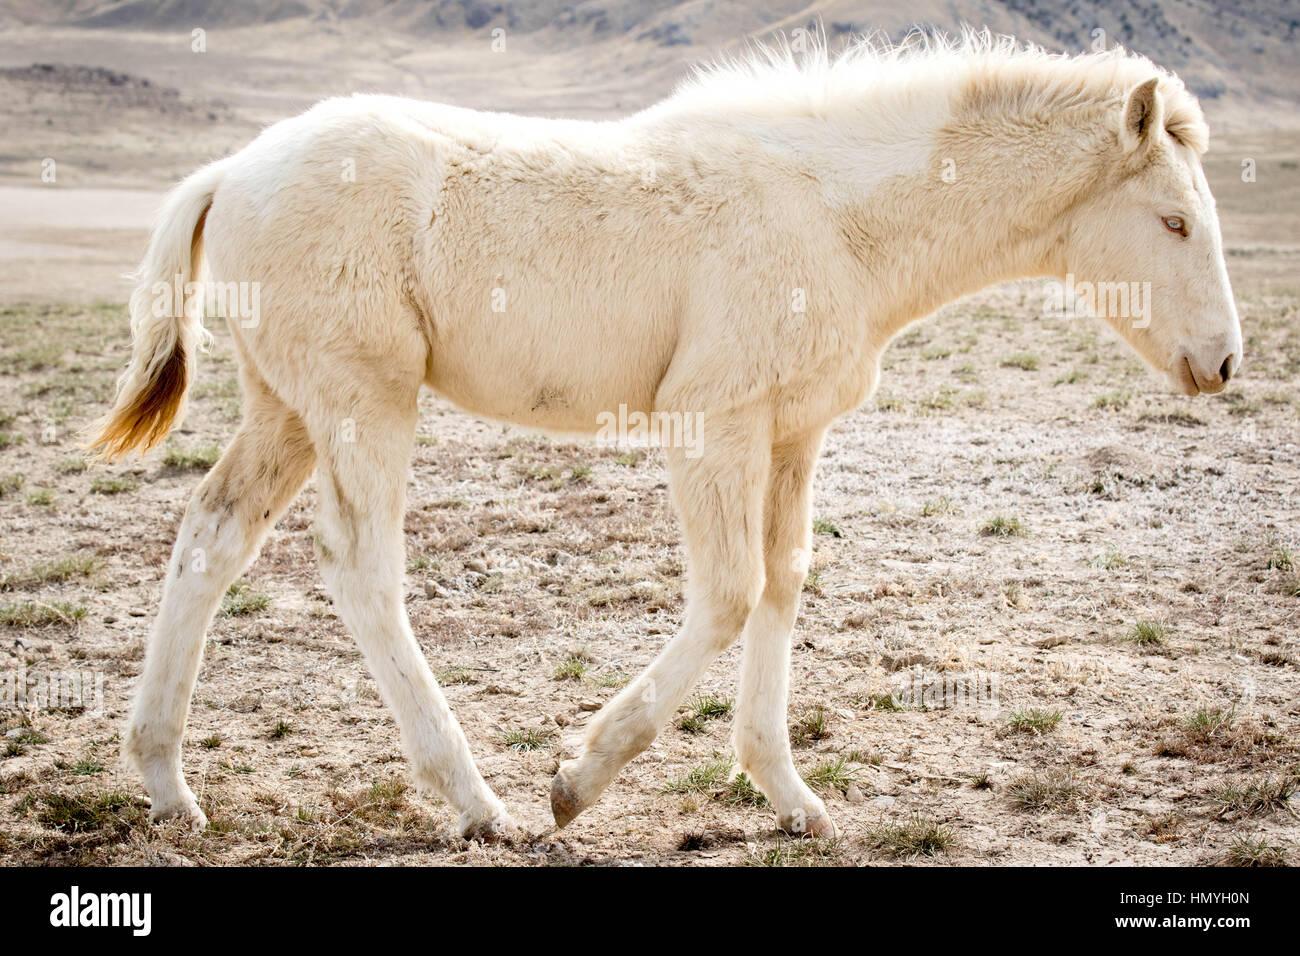 Stock Photo White Albino Mustang Profile (Equus ferus caballus) in West Desert, Utah, USA, North America Stock Photo